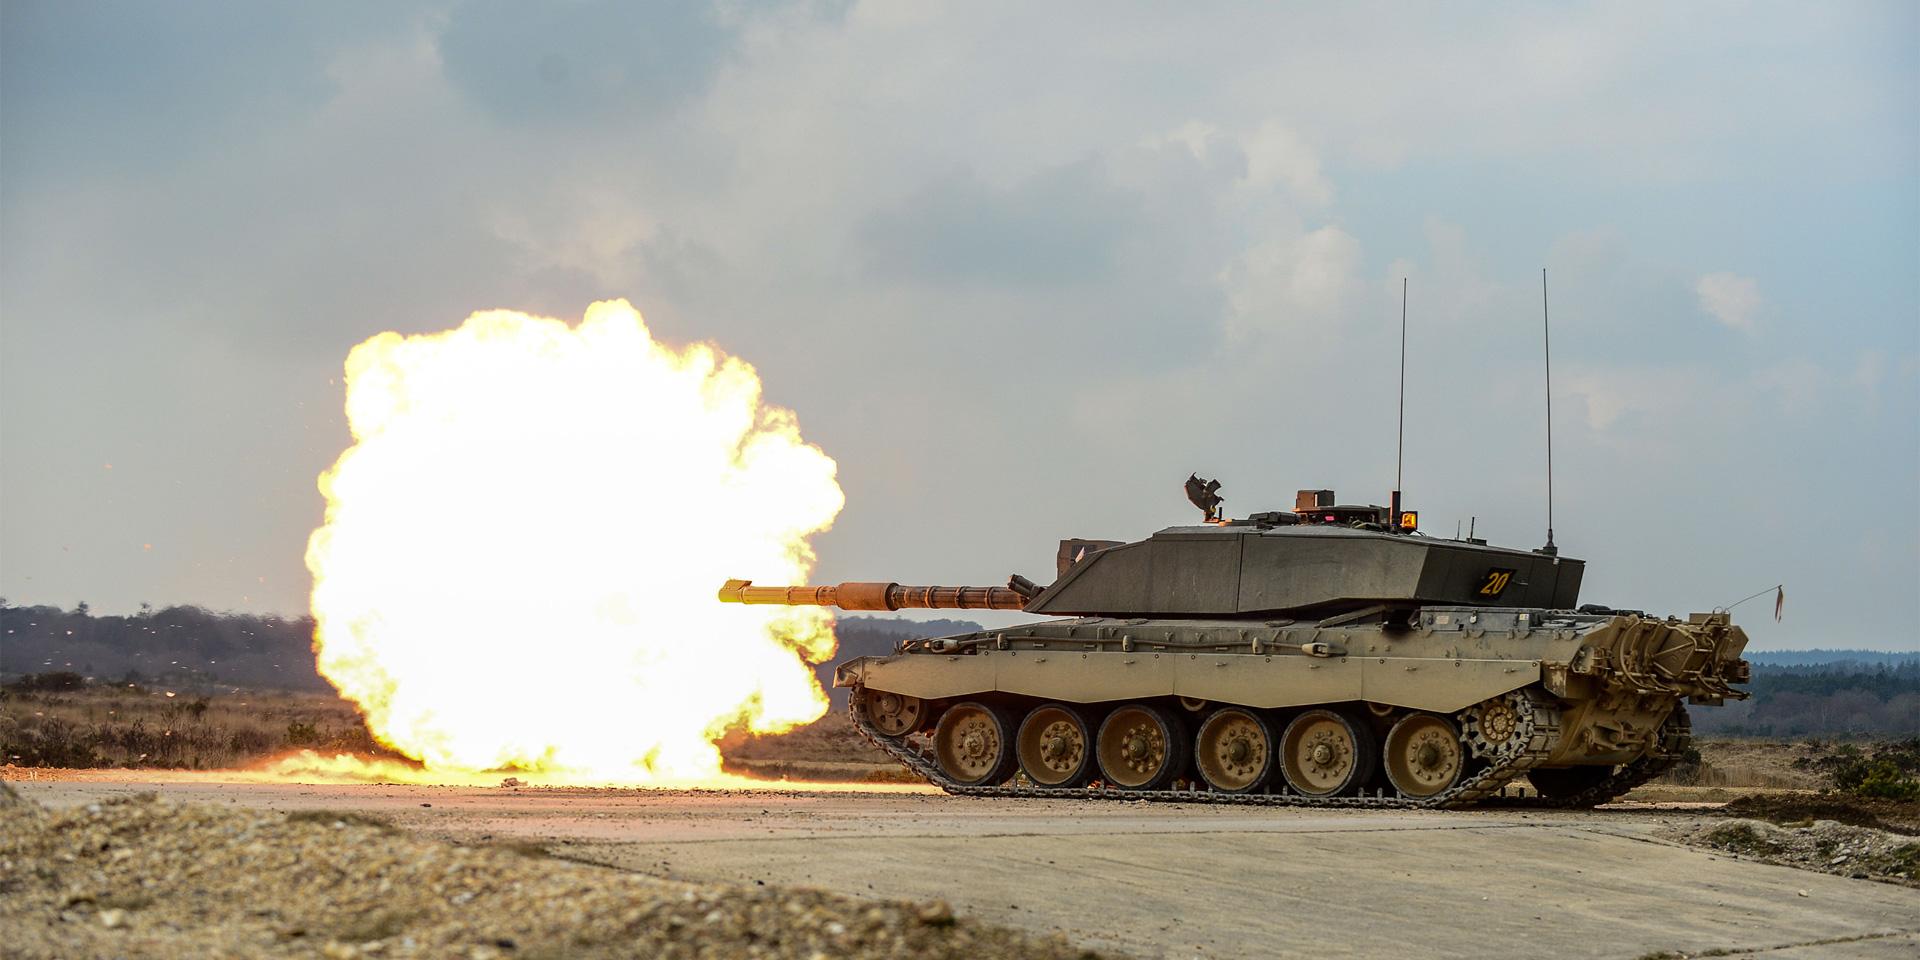 Challenger 2 tank, Lulworth Ranges, Dorset, 2016